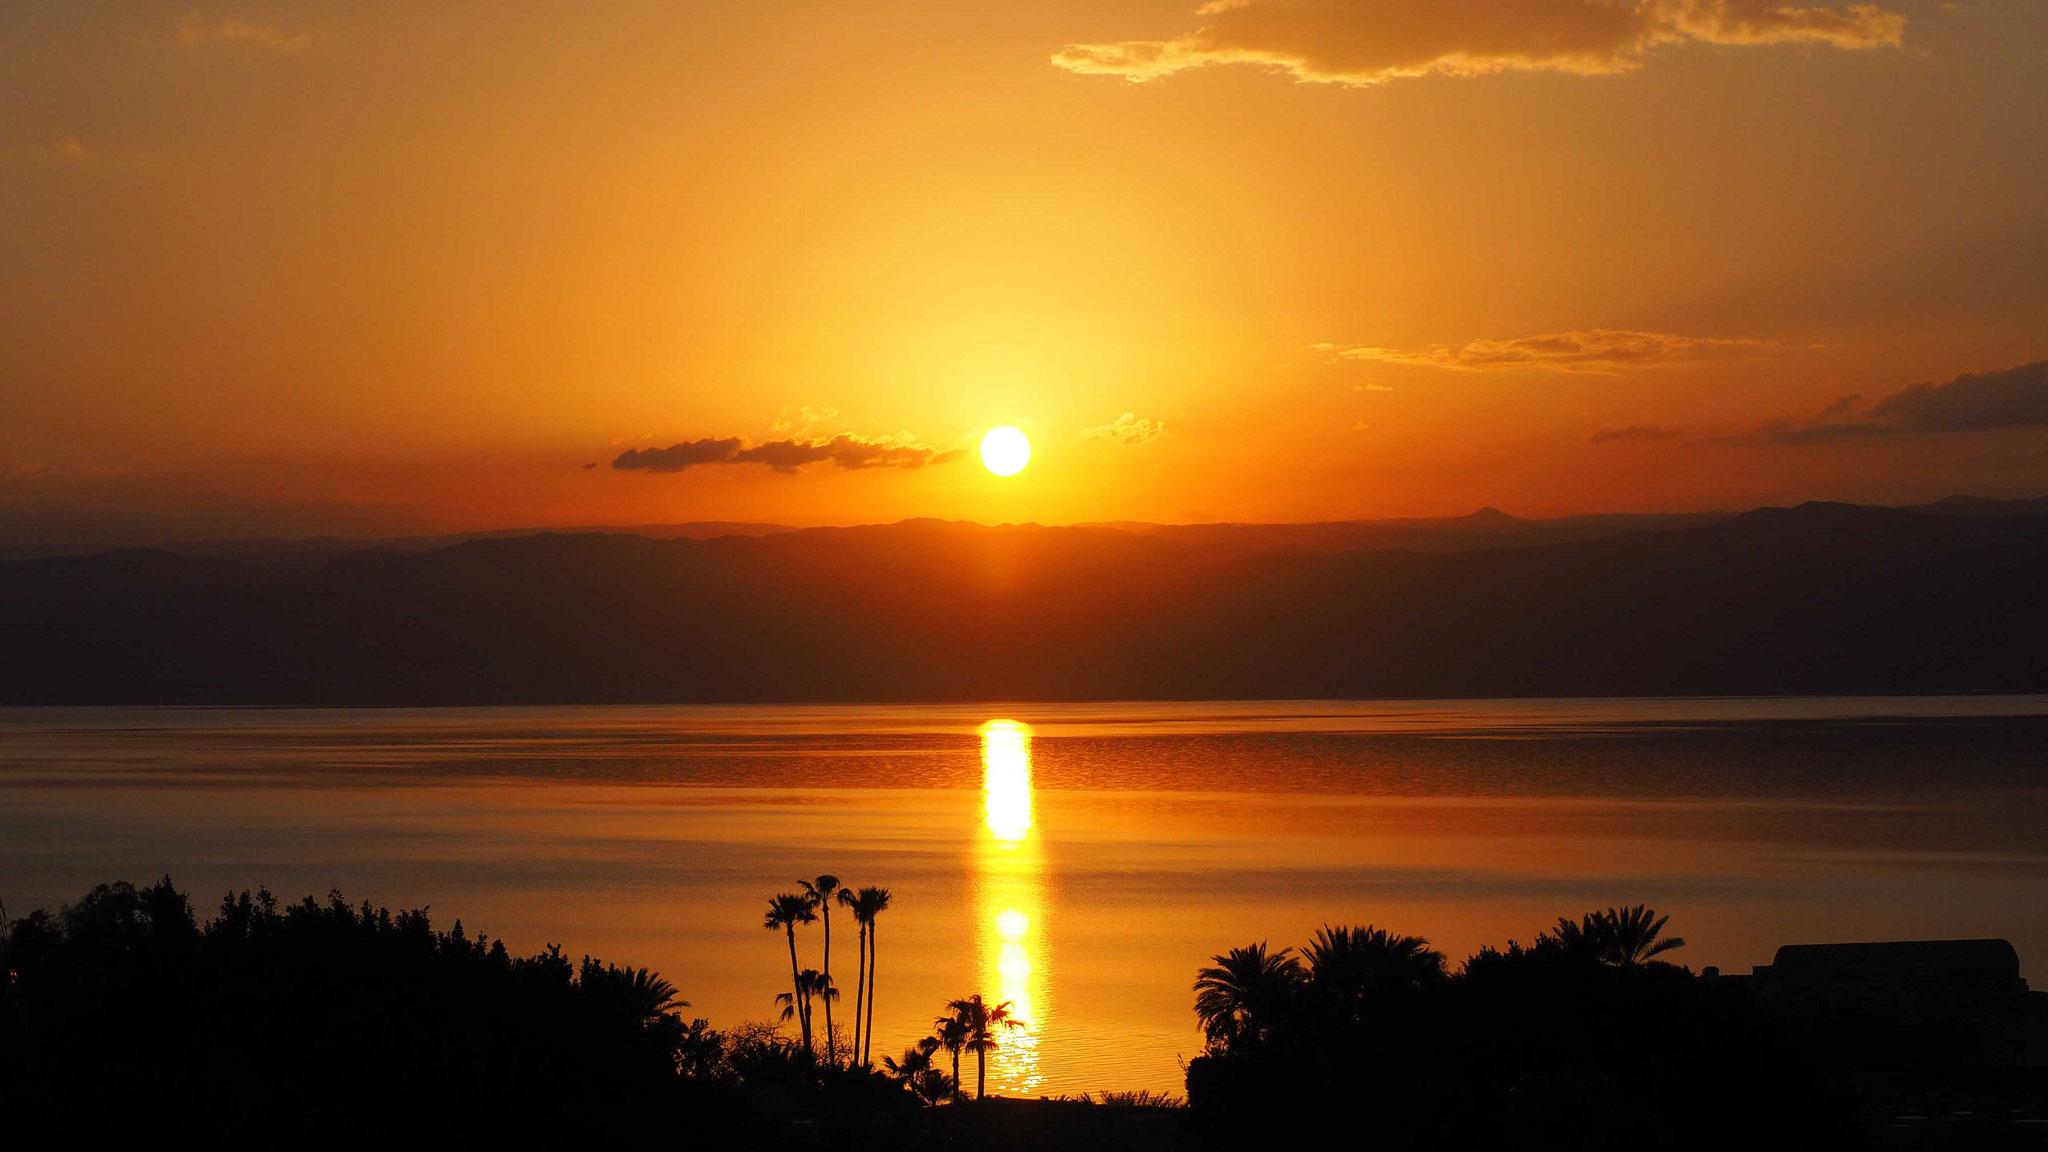 Coucher de soleil - Mer morte - Jordanie